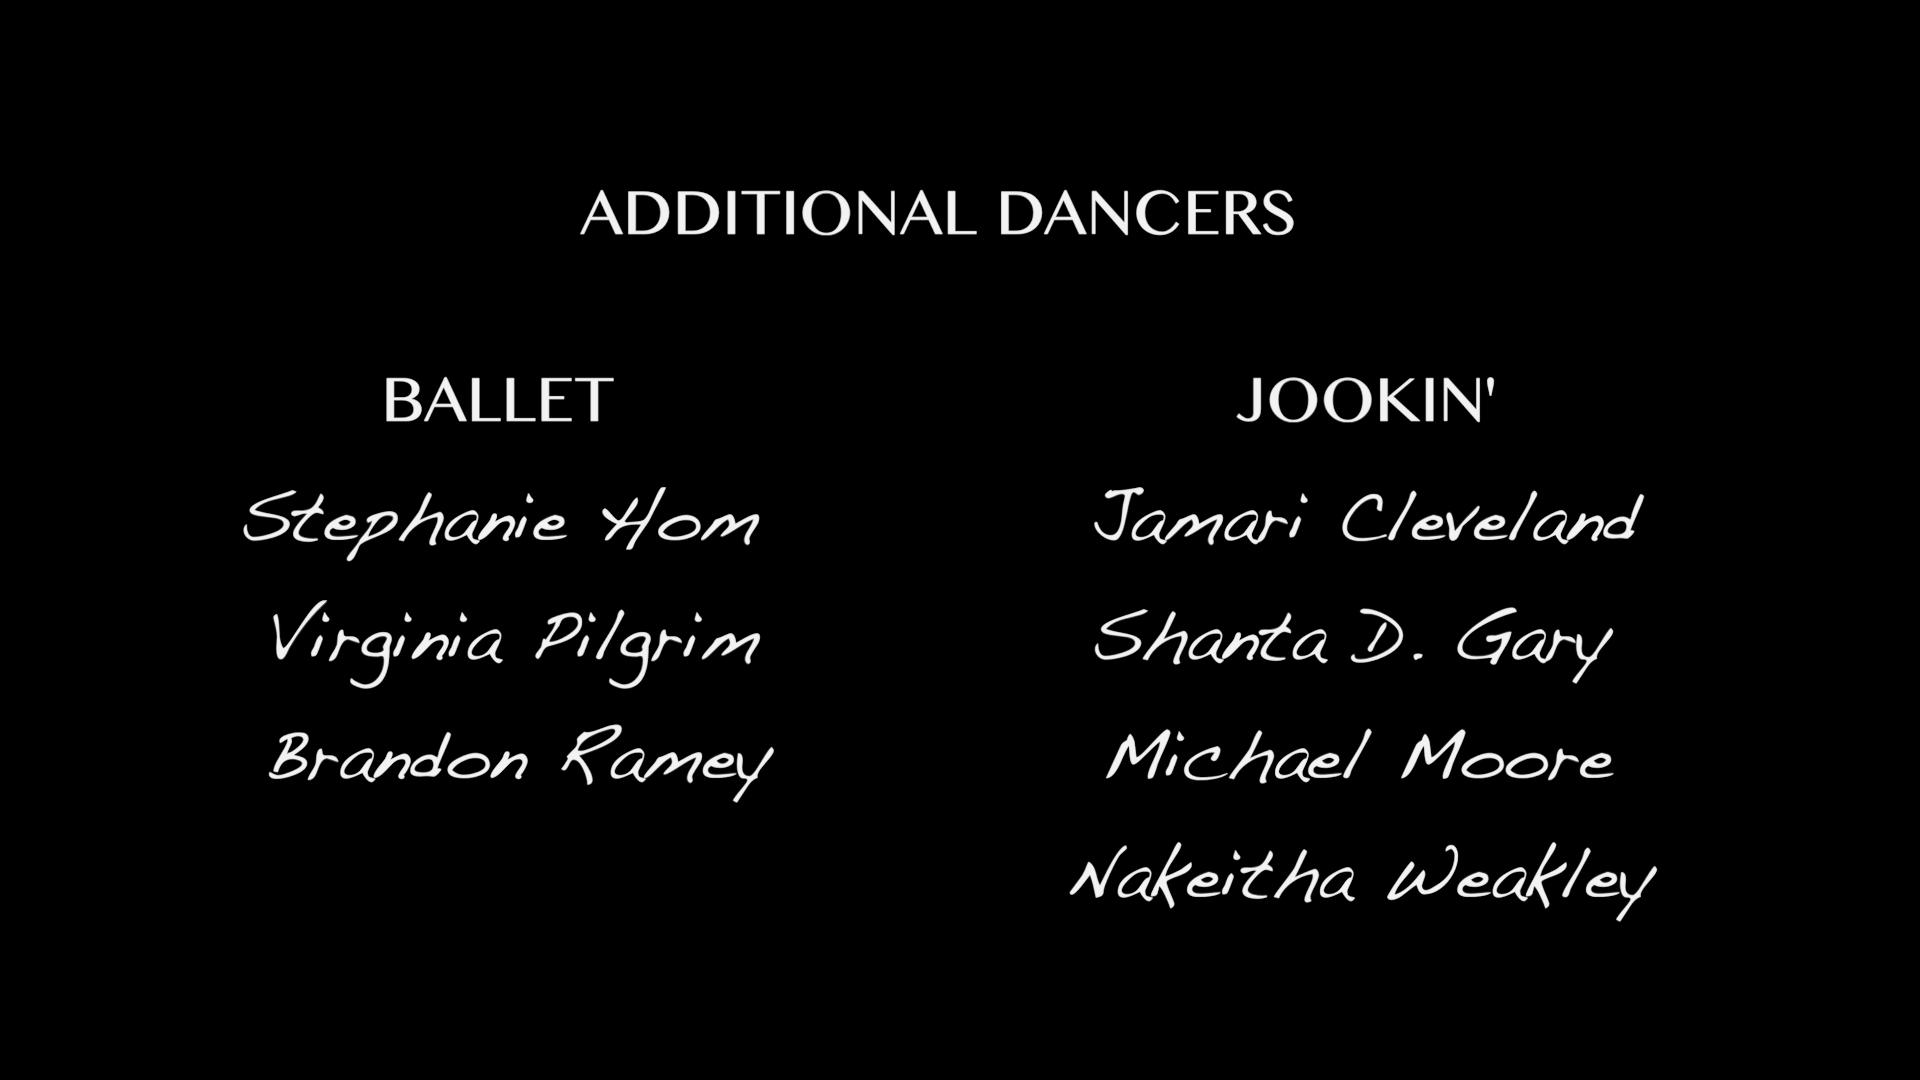 Additional Dancers(sm).jpg